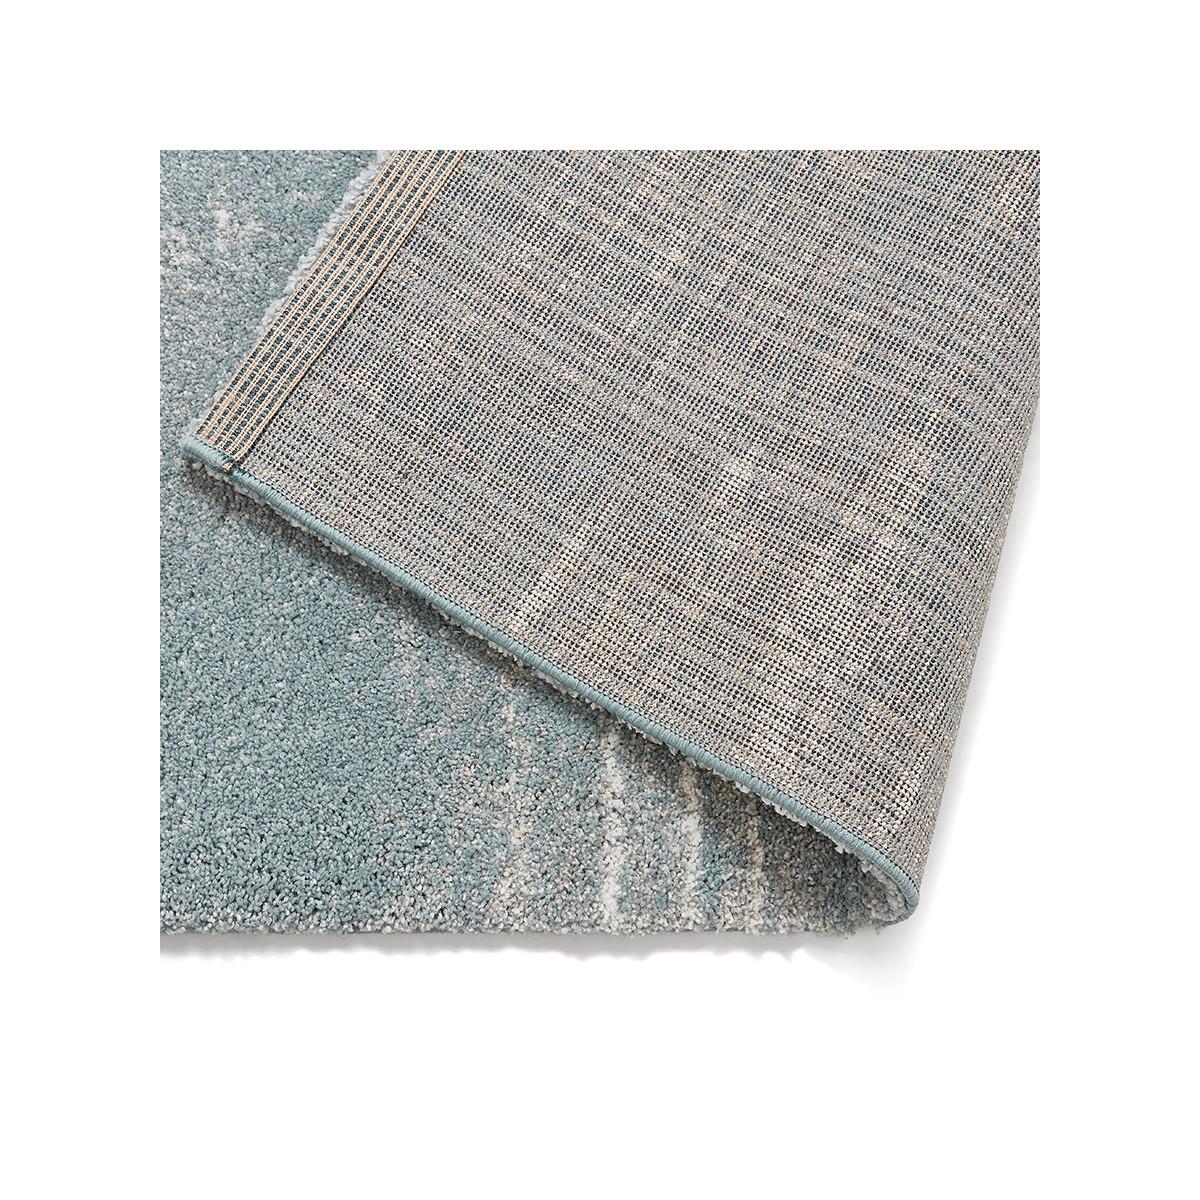 tapis design rectangulaire 160x230 cm sherine bleu ciel amp story 6992